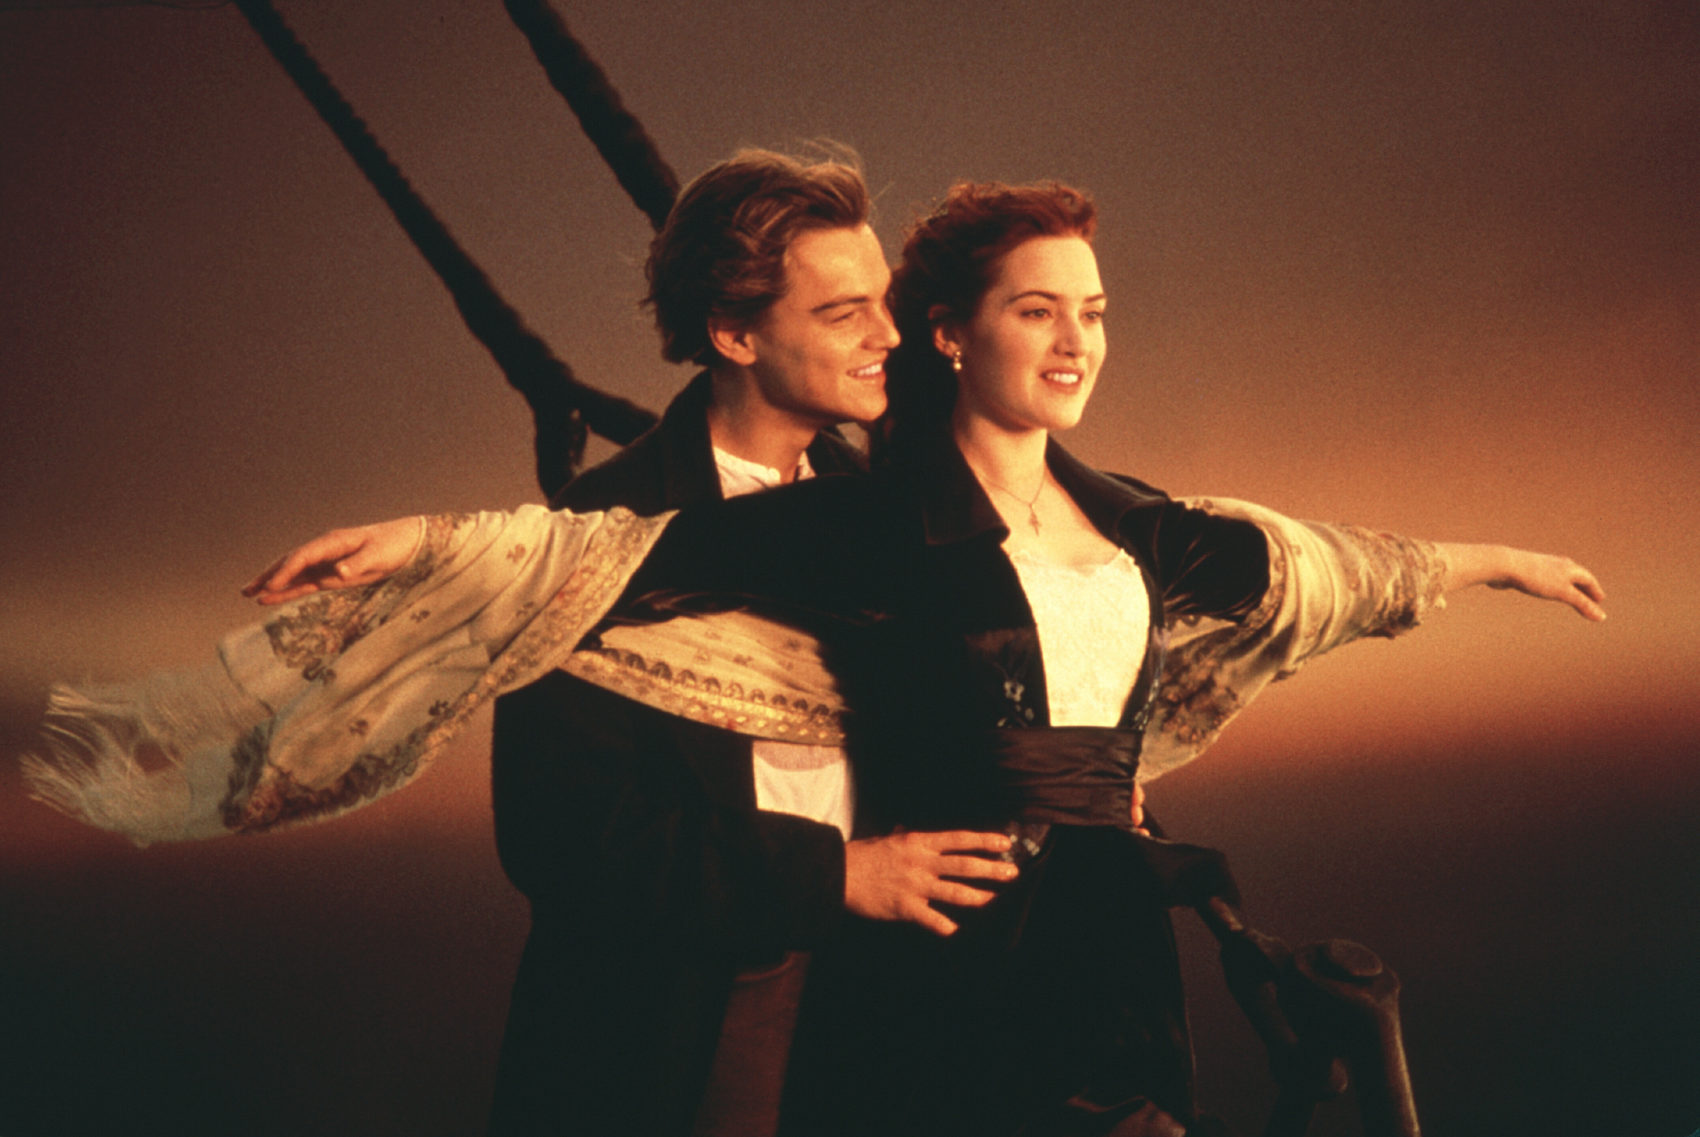 comPOSERS Episode 47: Titanic